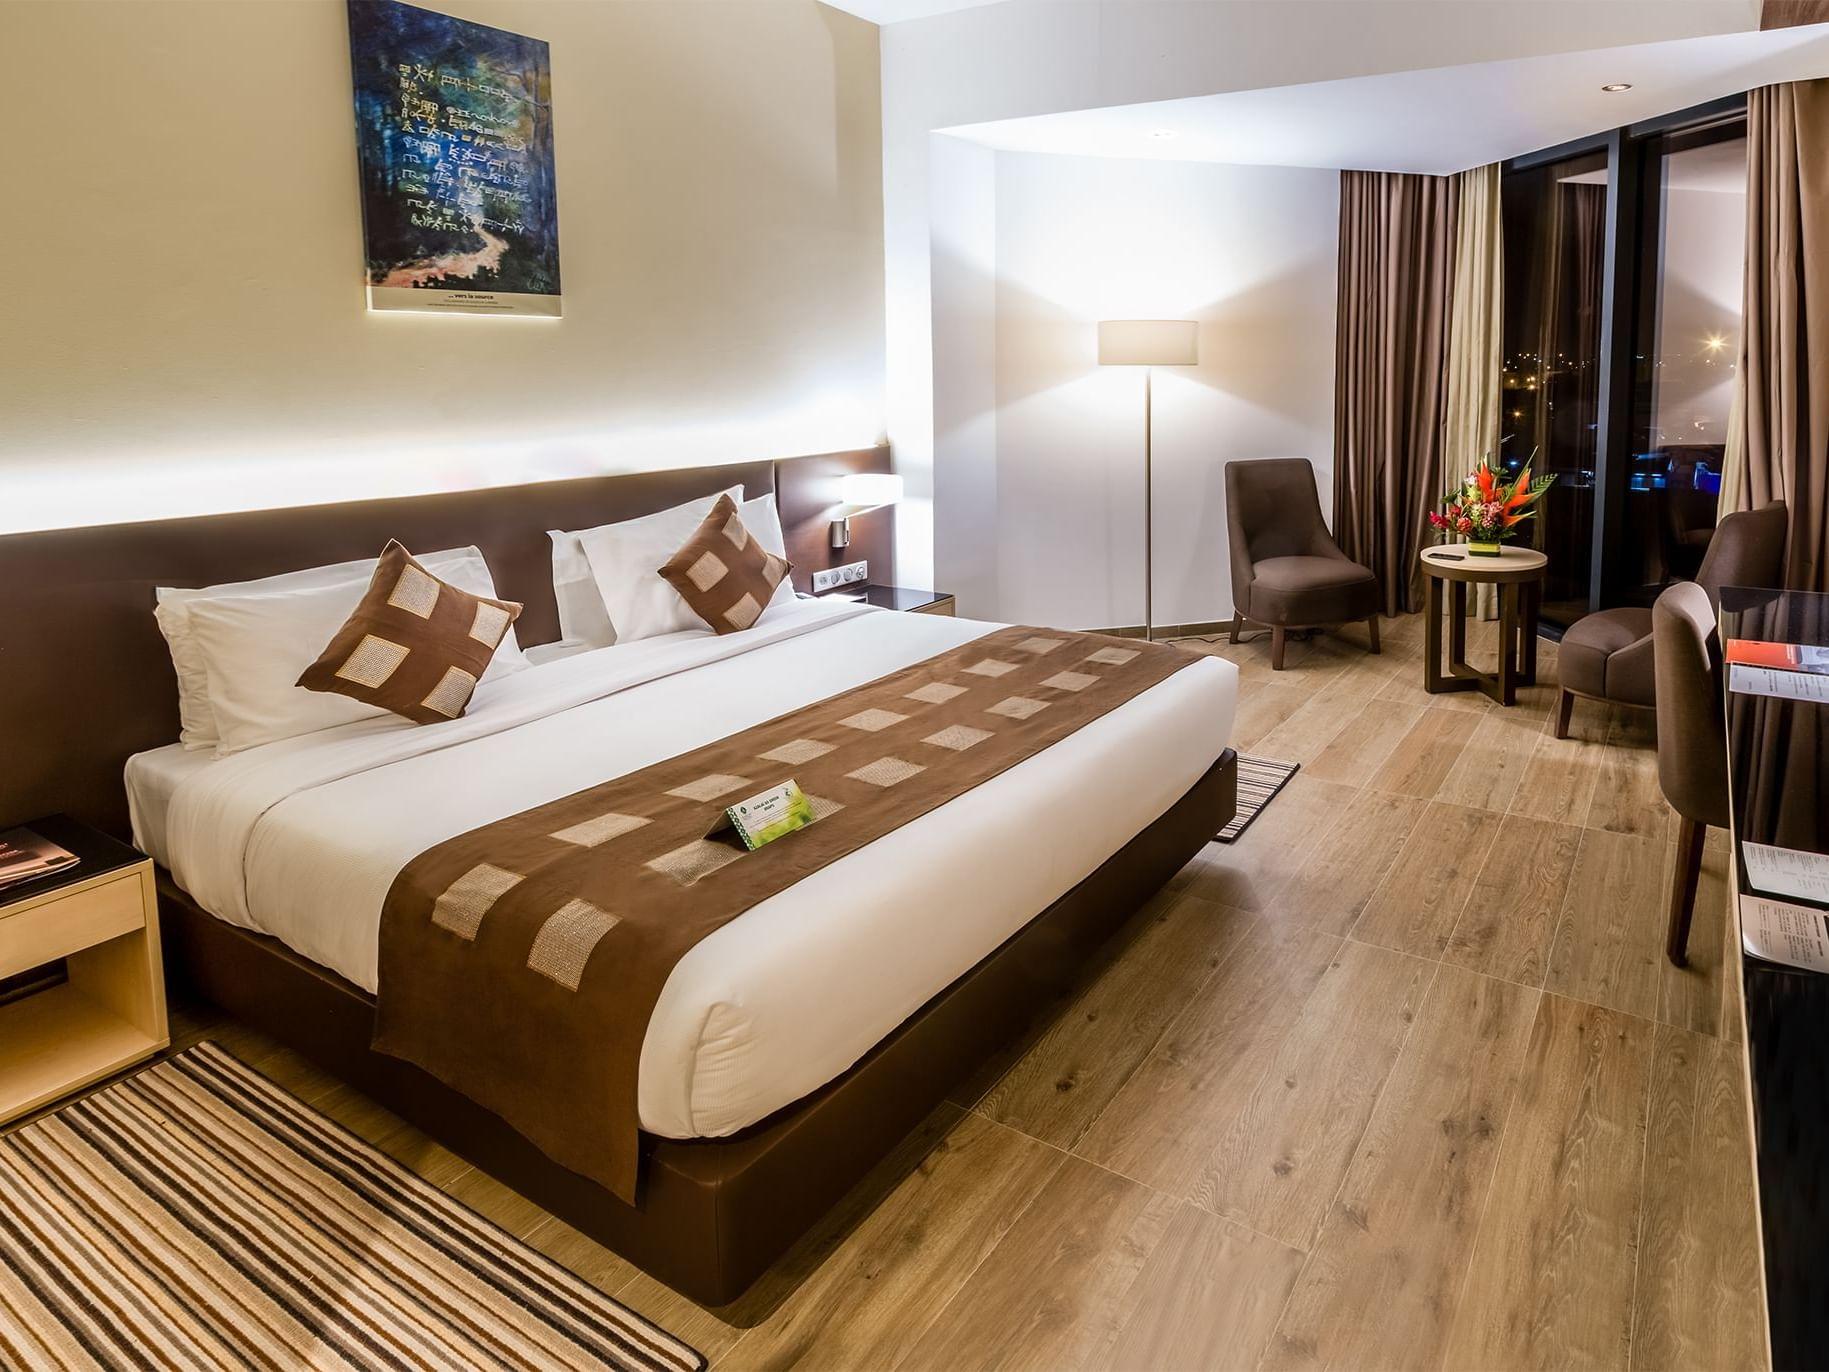 Standard room in the Azalai Hotel Abidjan